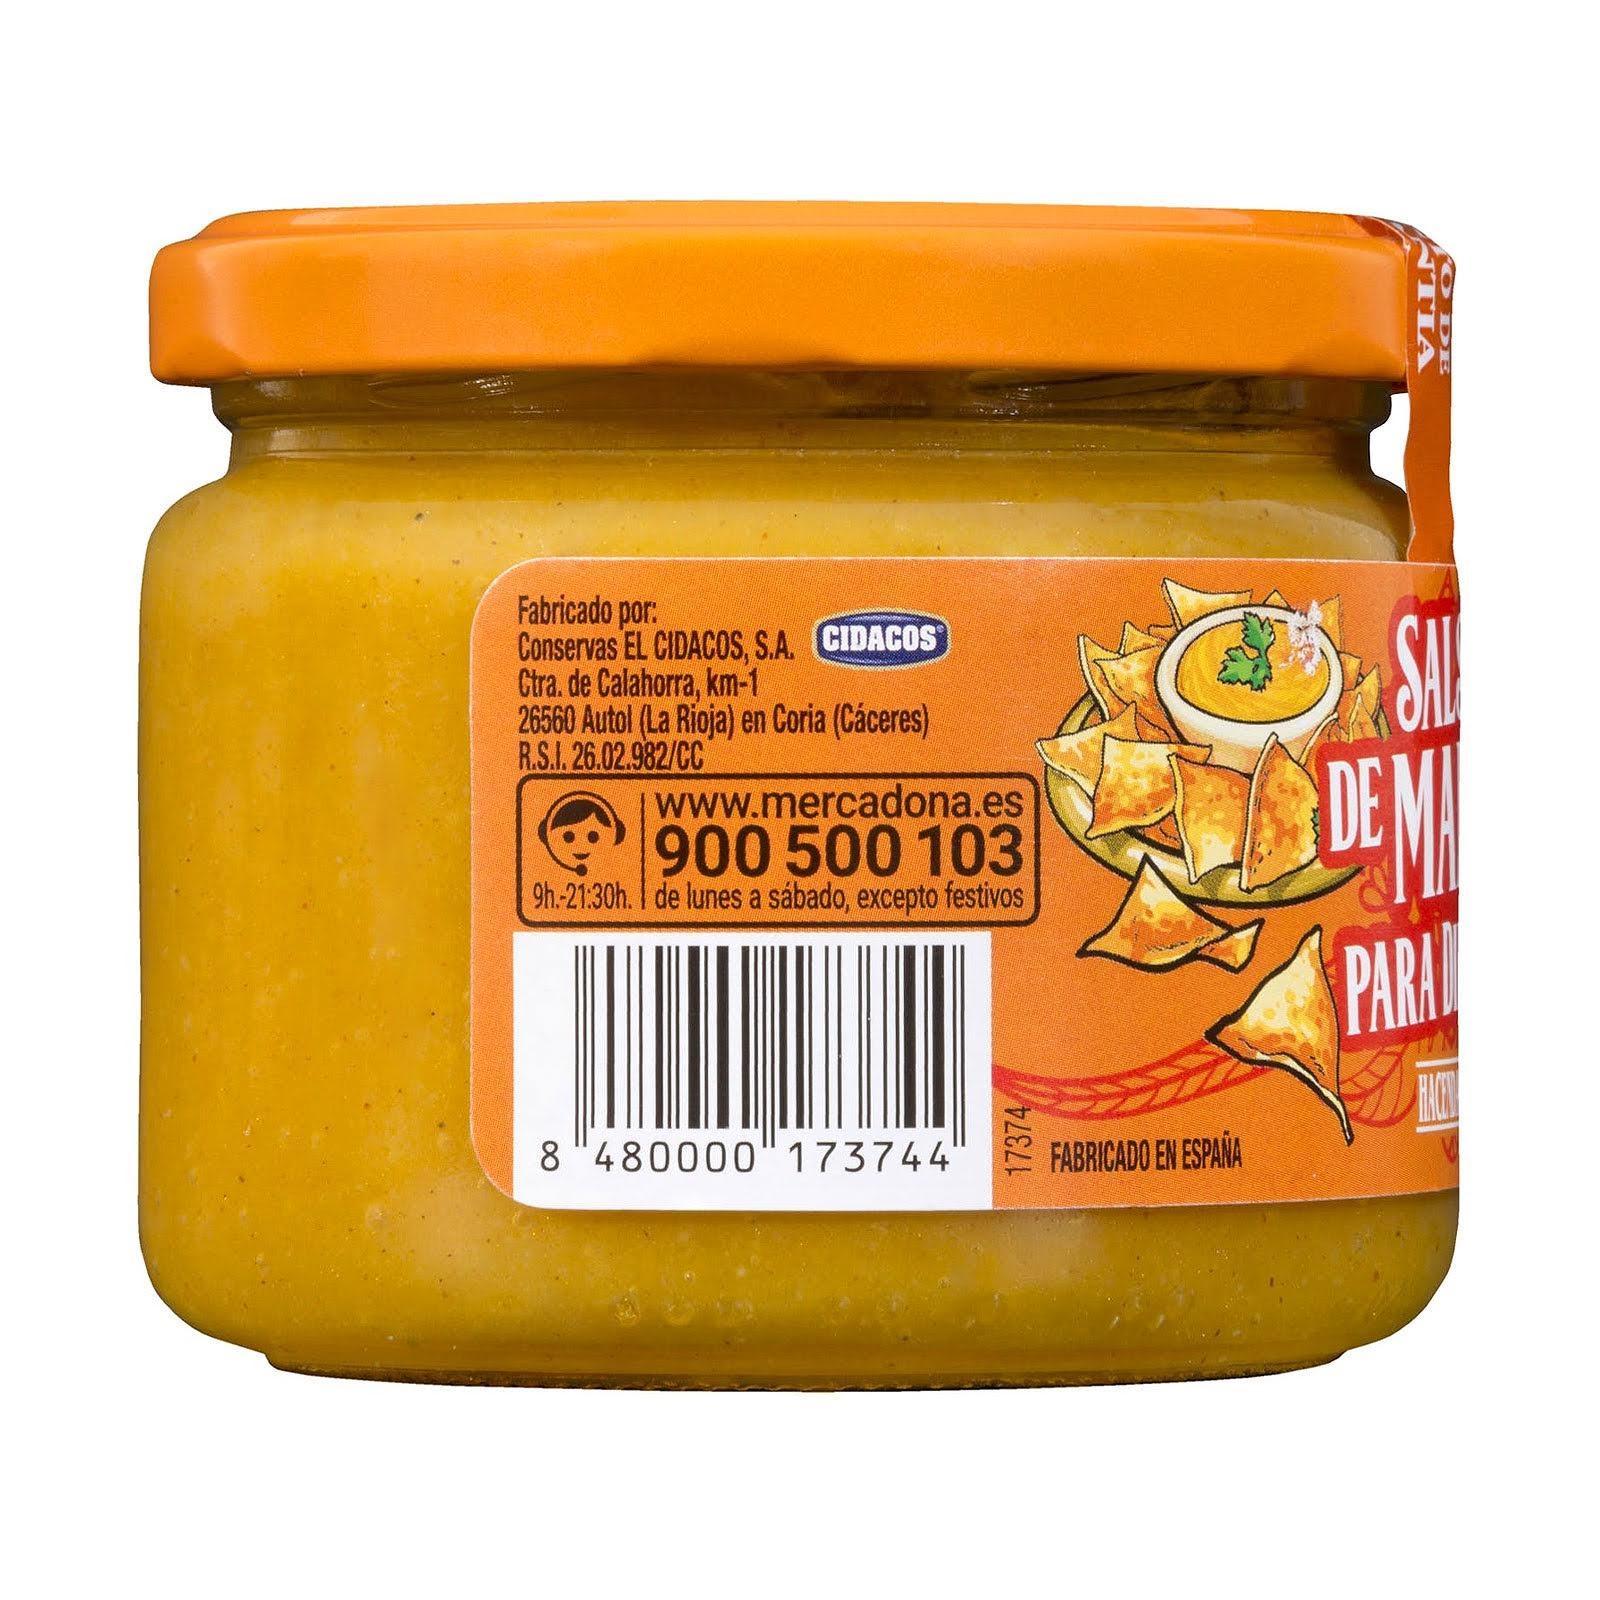 Salsa de mango para dipear Hacendado